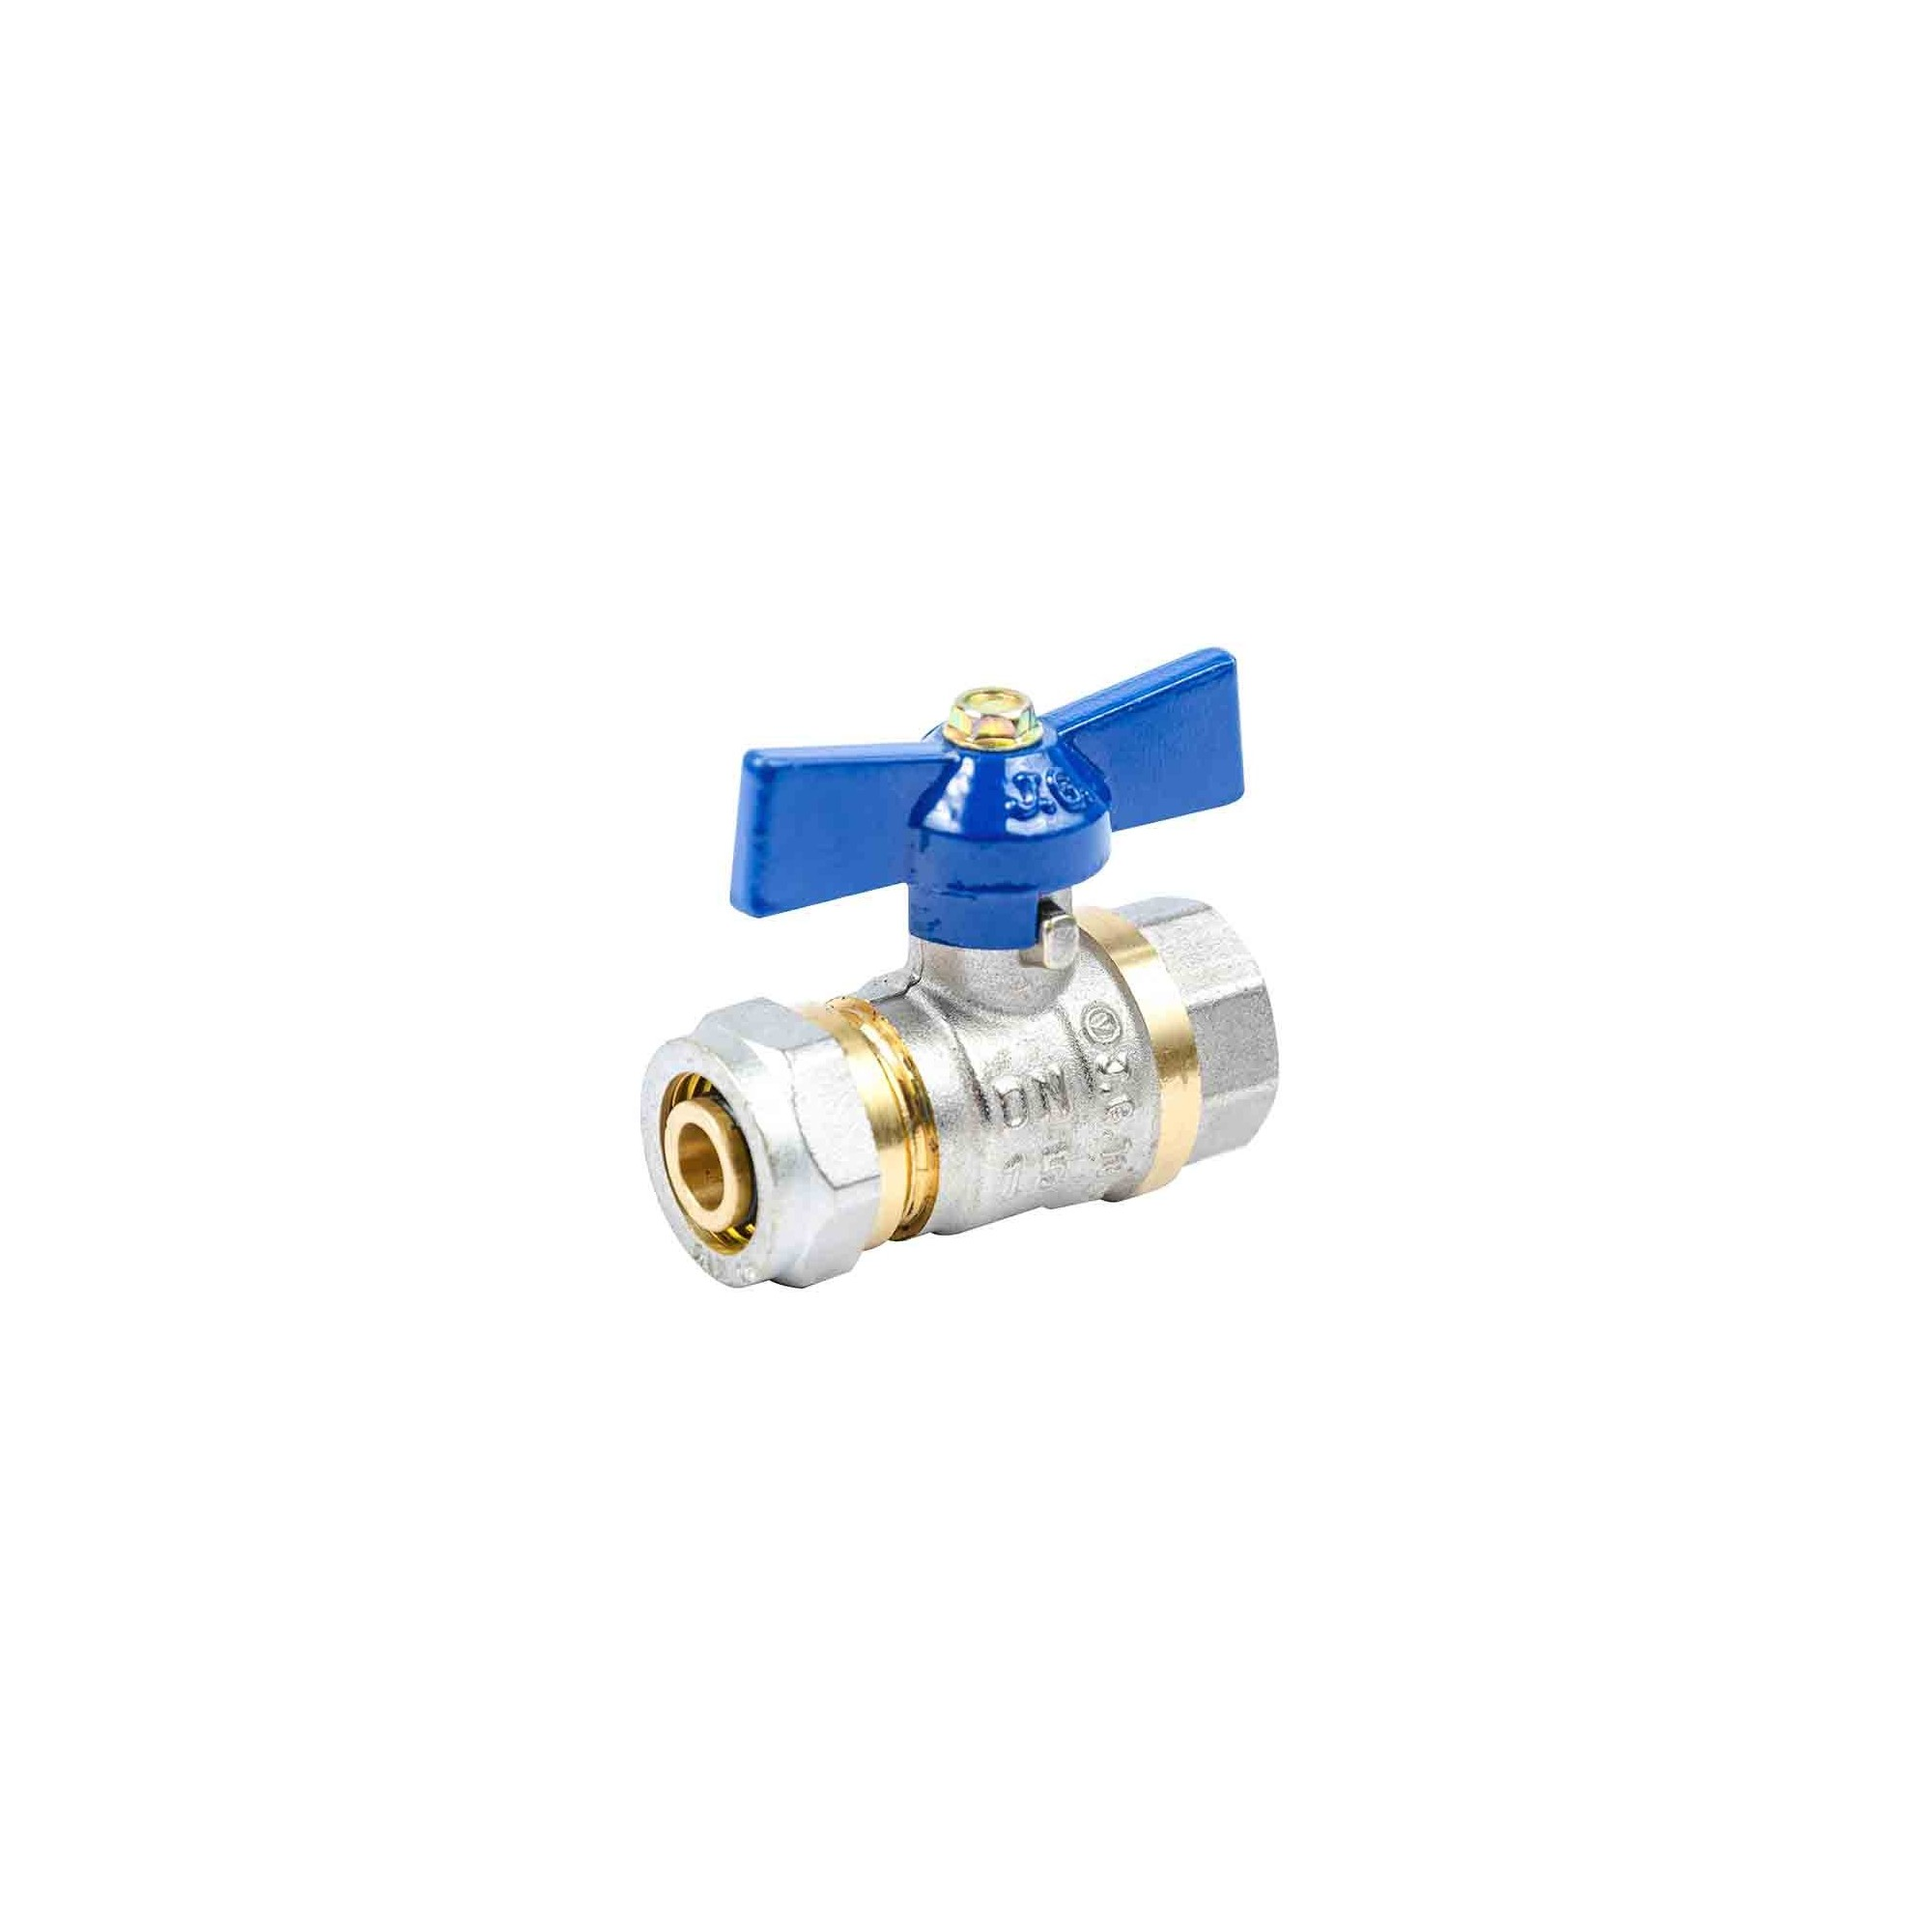 Кран для металлопластика 16*1/2в JG усиленный J.G. - 1